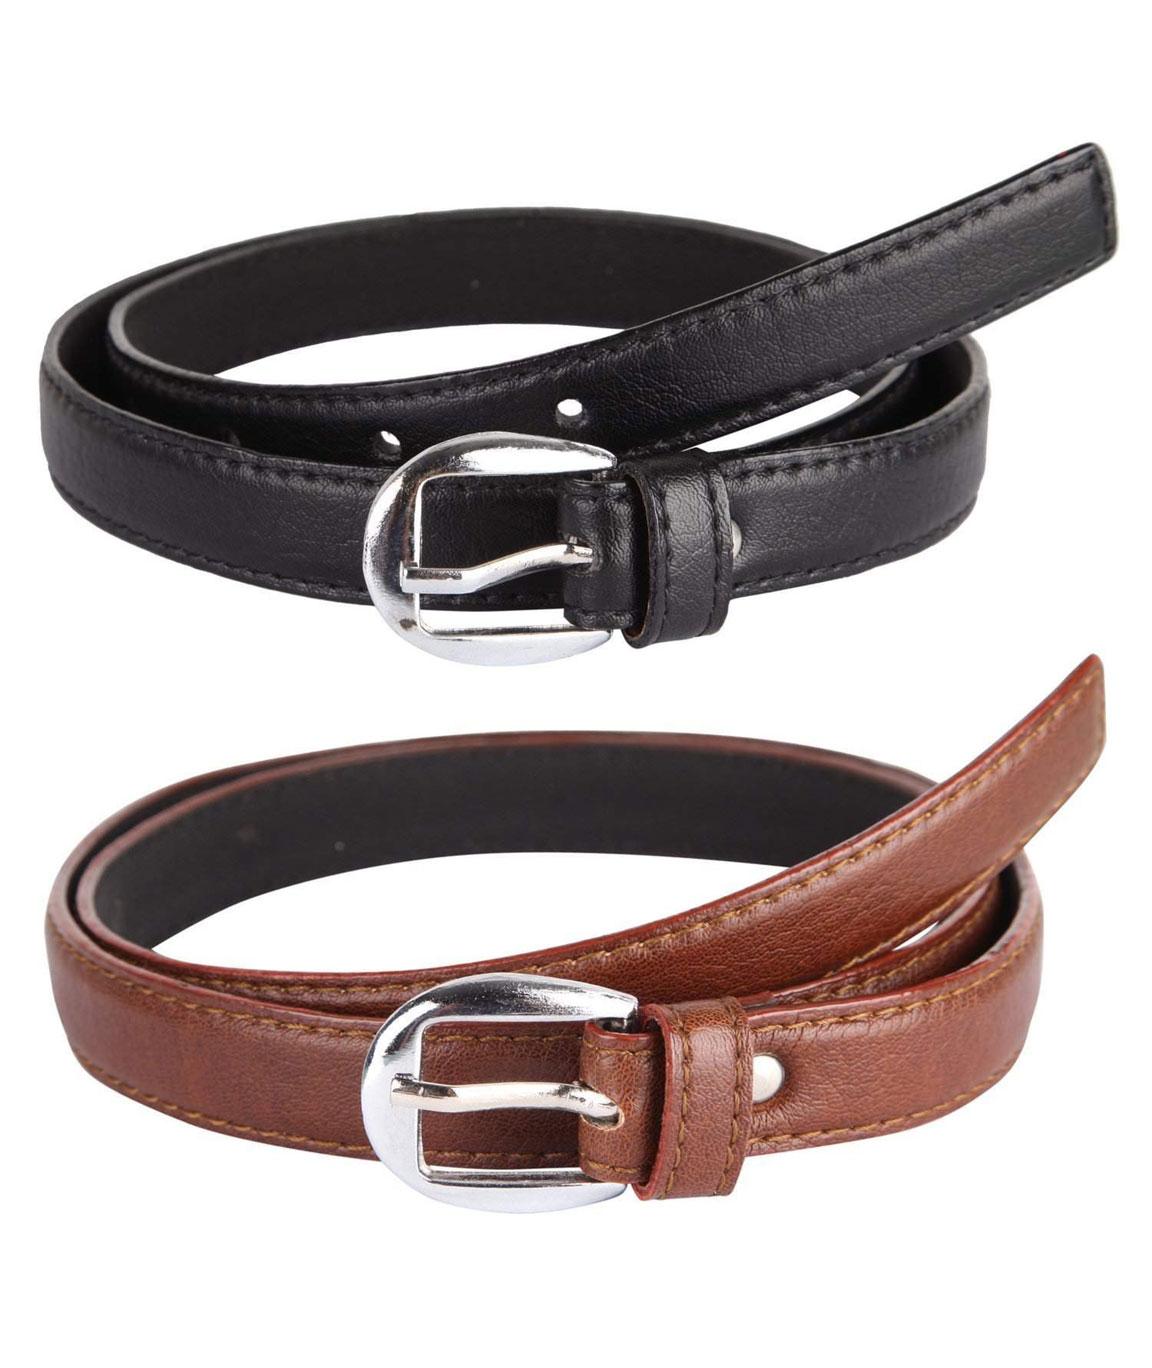 DN Enterprises Latest Design Girl`s PU Leather Belt/Party Wear Belt For Women/Girl…Pack Of 2 (BLAK-BROWN)